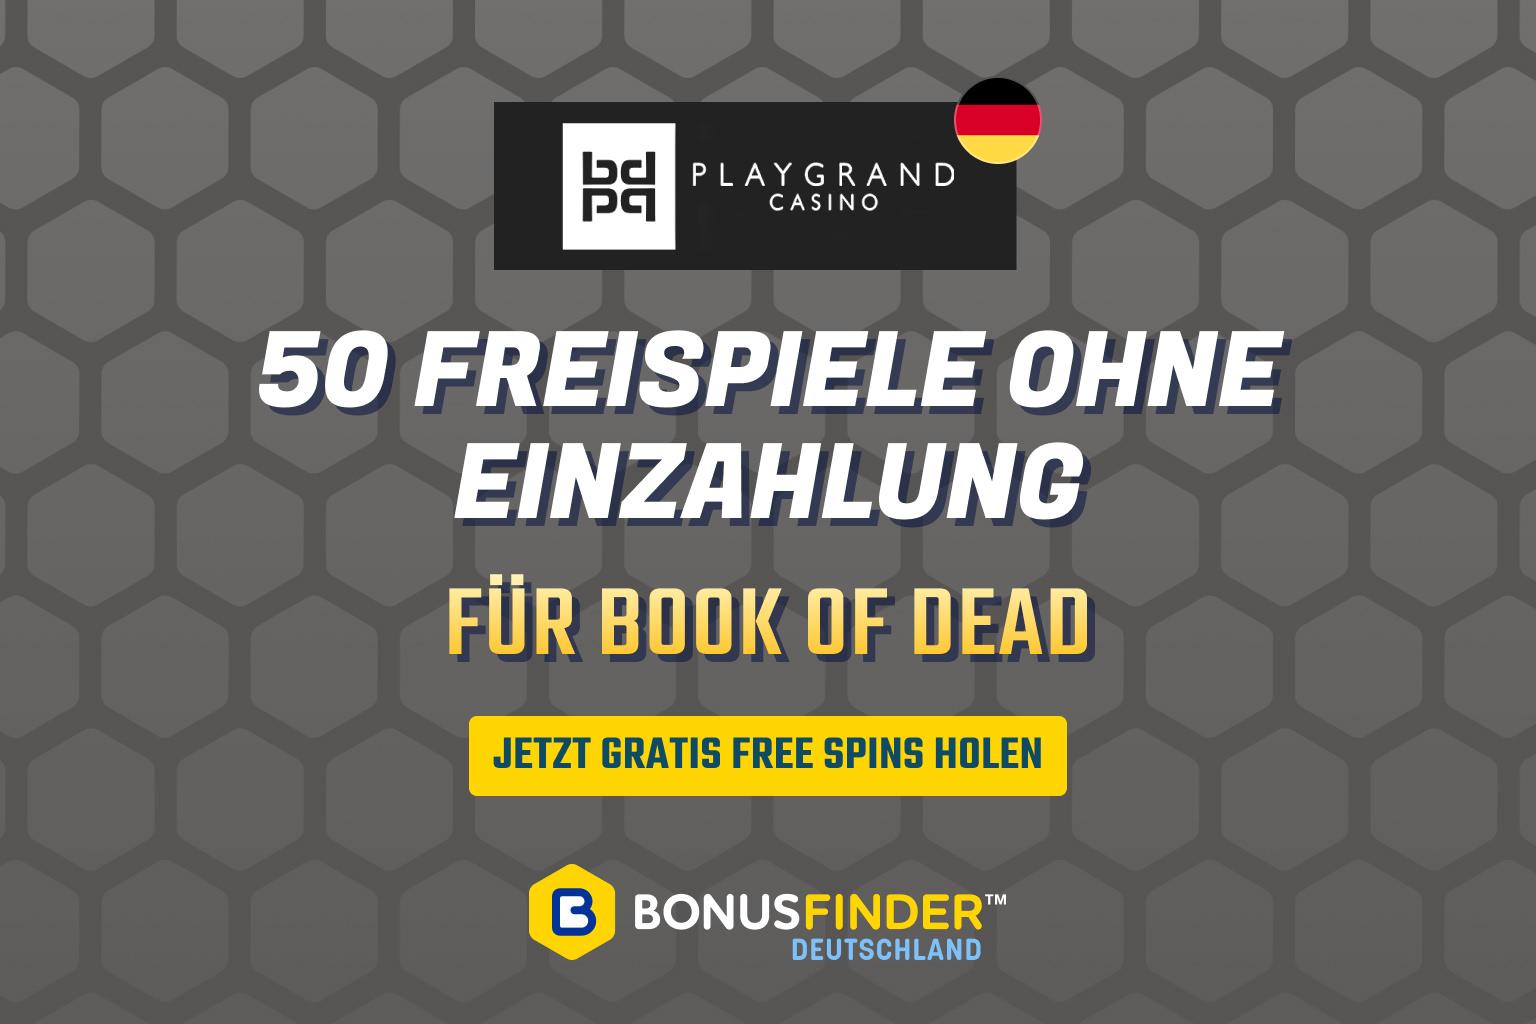 playgrand book of dead freispiele